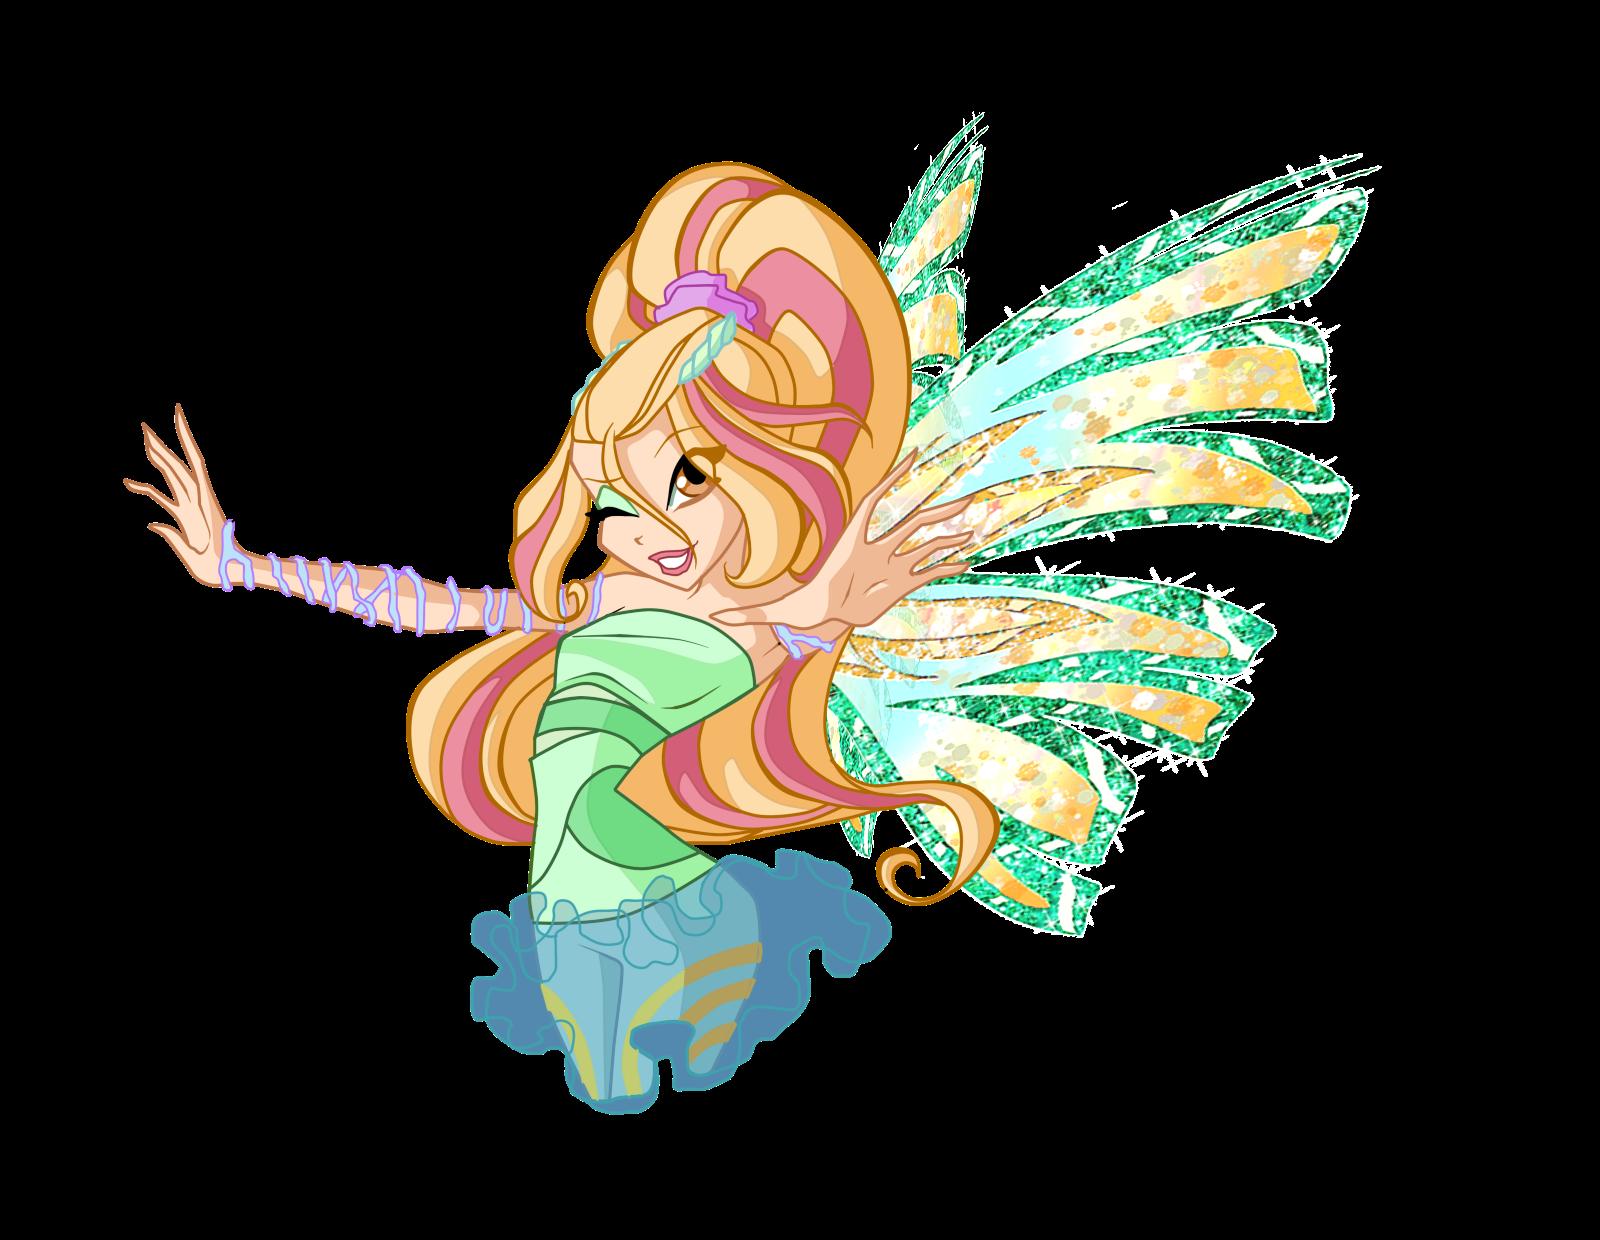 Winx club fairies daphne nymph of sirenix - Winx club sirenix ...